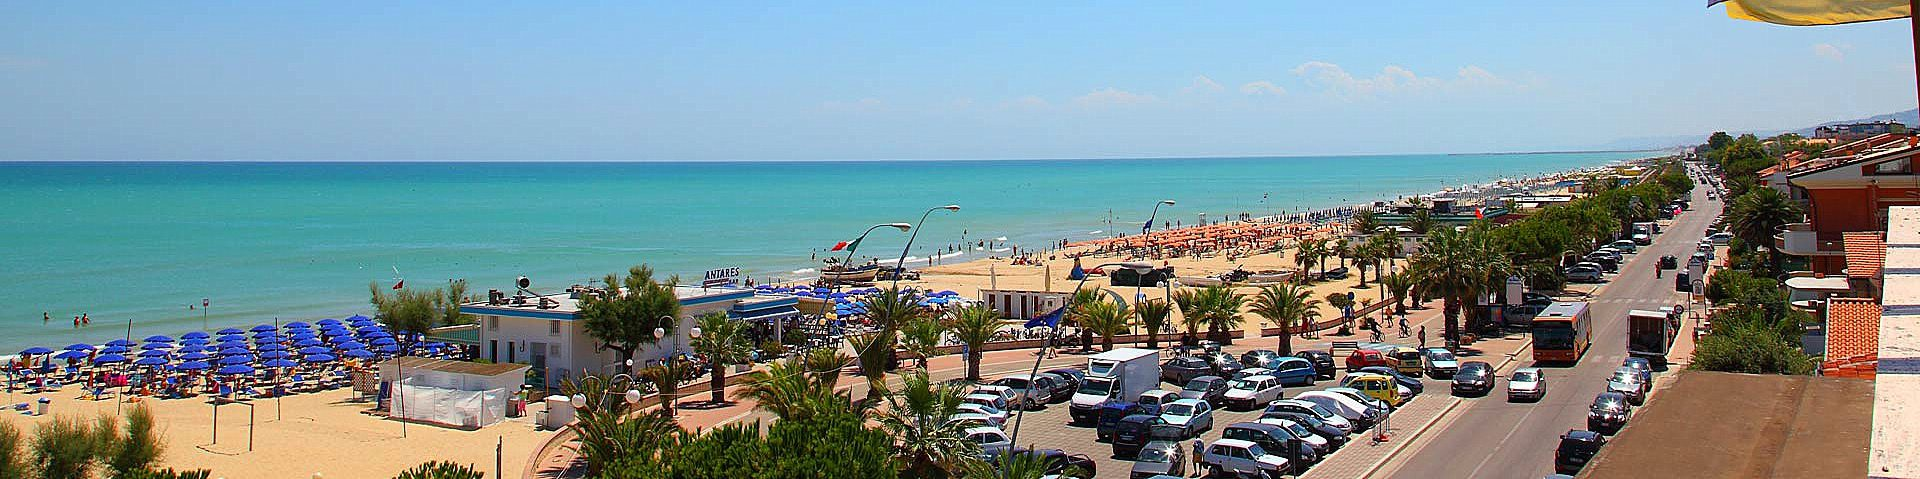 Tortoreto Lido, pláž a promenáda v centru